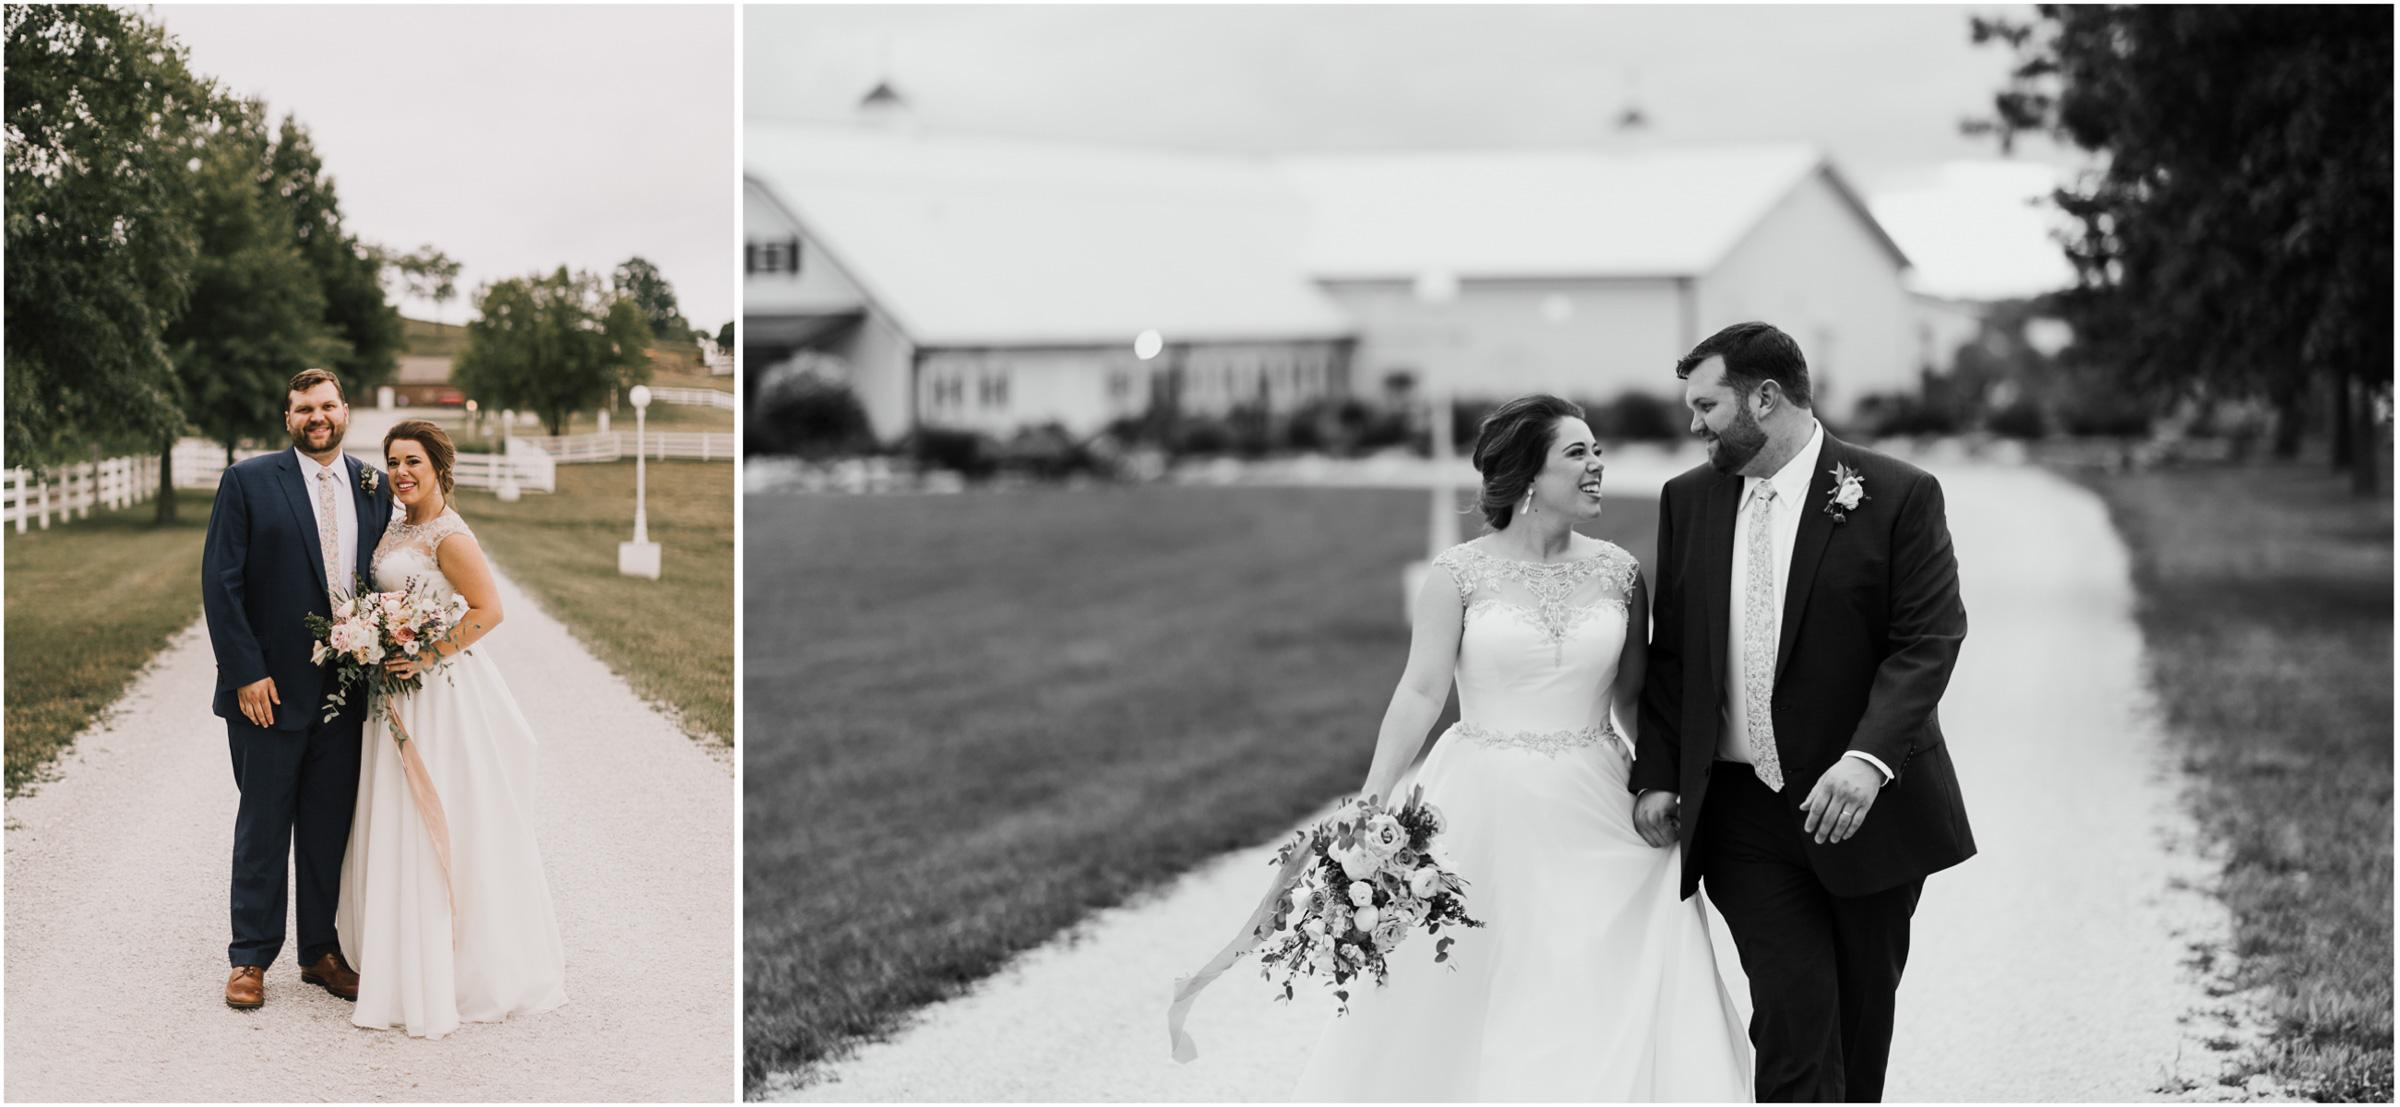 alyssa barletter photography summer odessa missouri wedding kansas city photographer-62.jpg